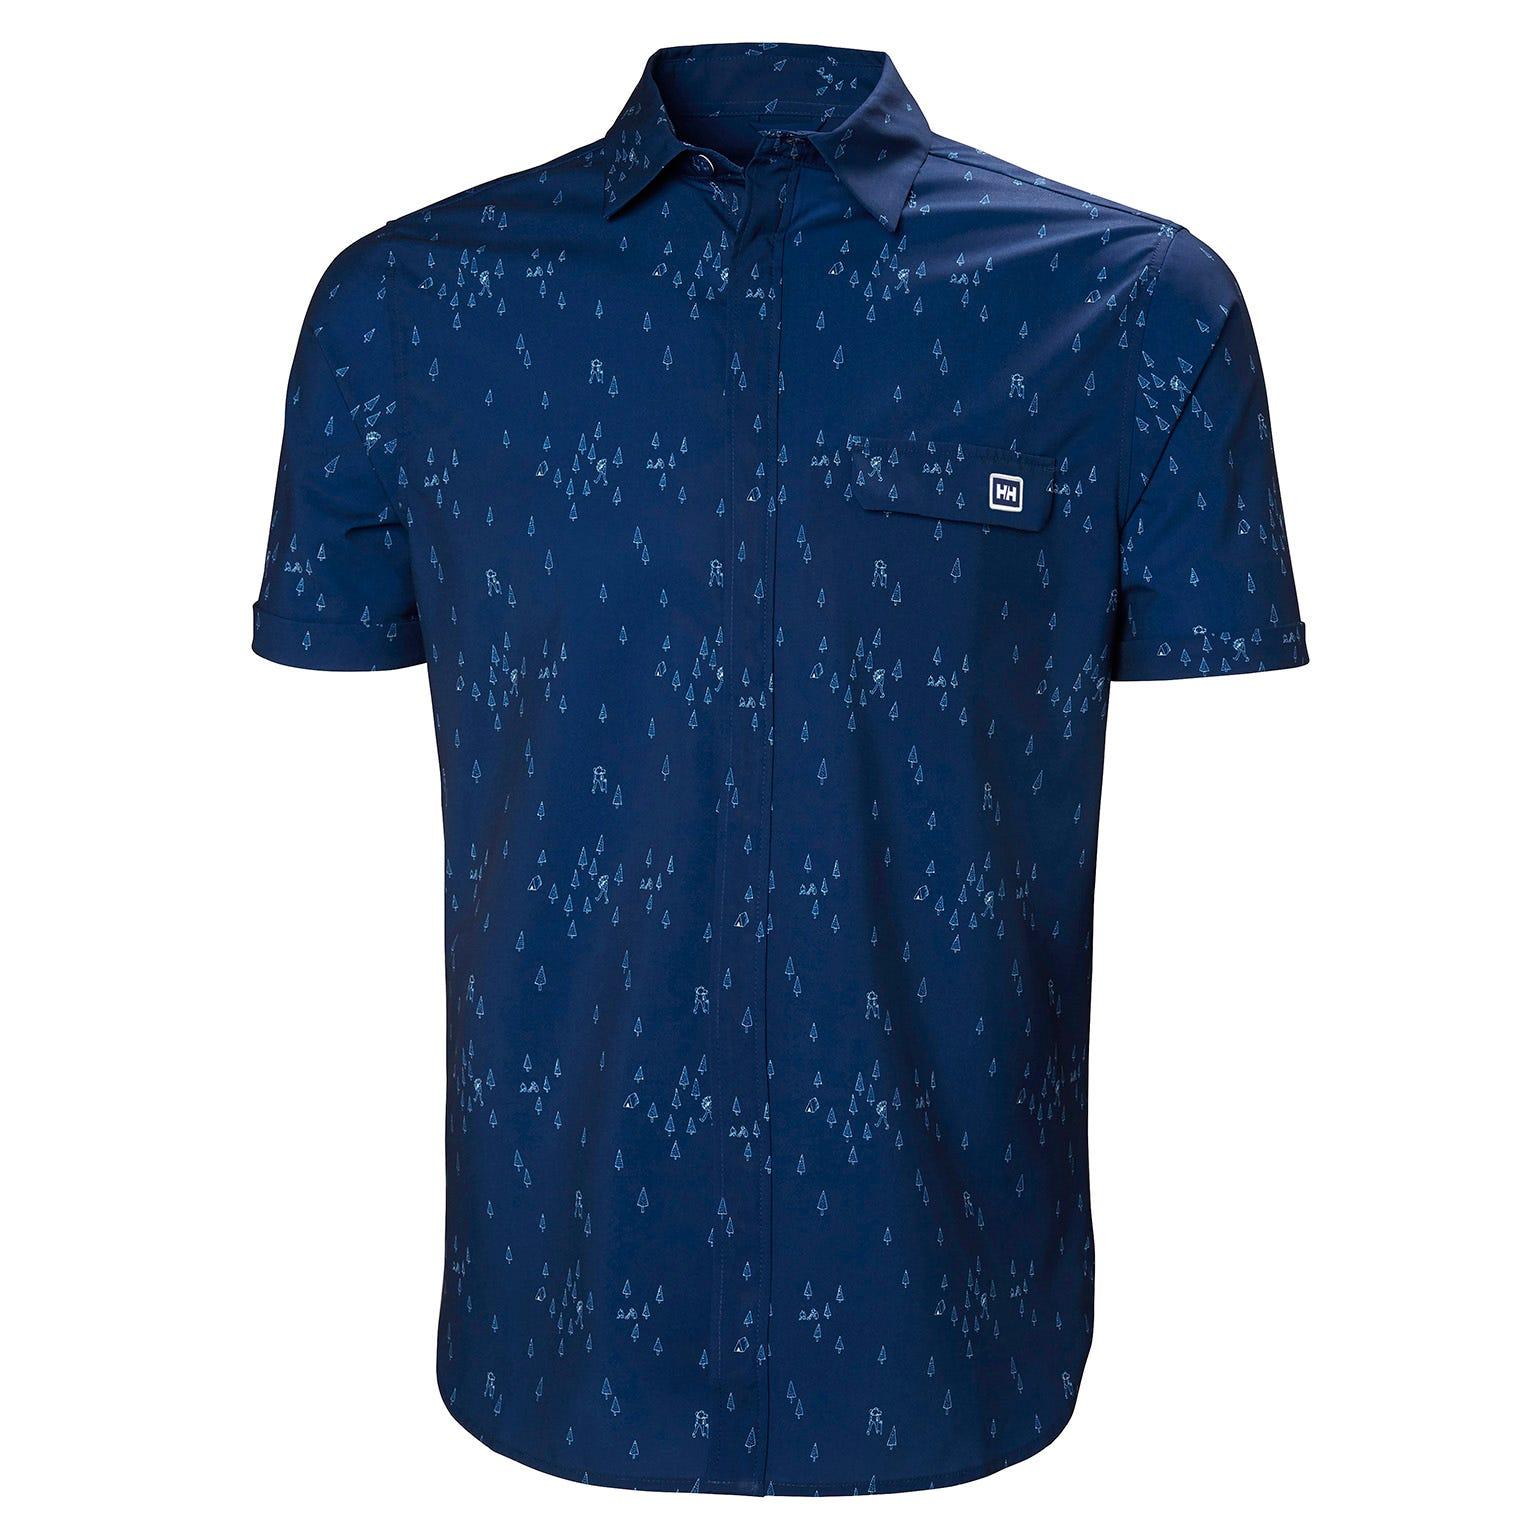 Helly Hansen Oya Shirt Mens Midlayer Blue S